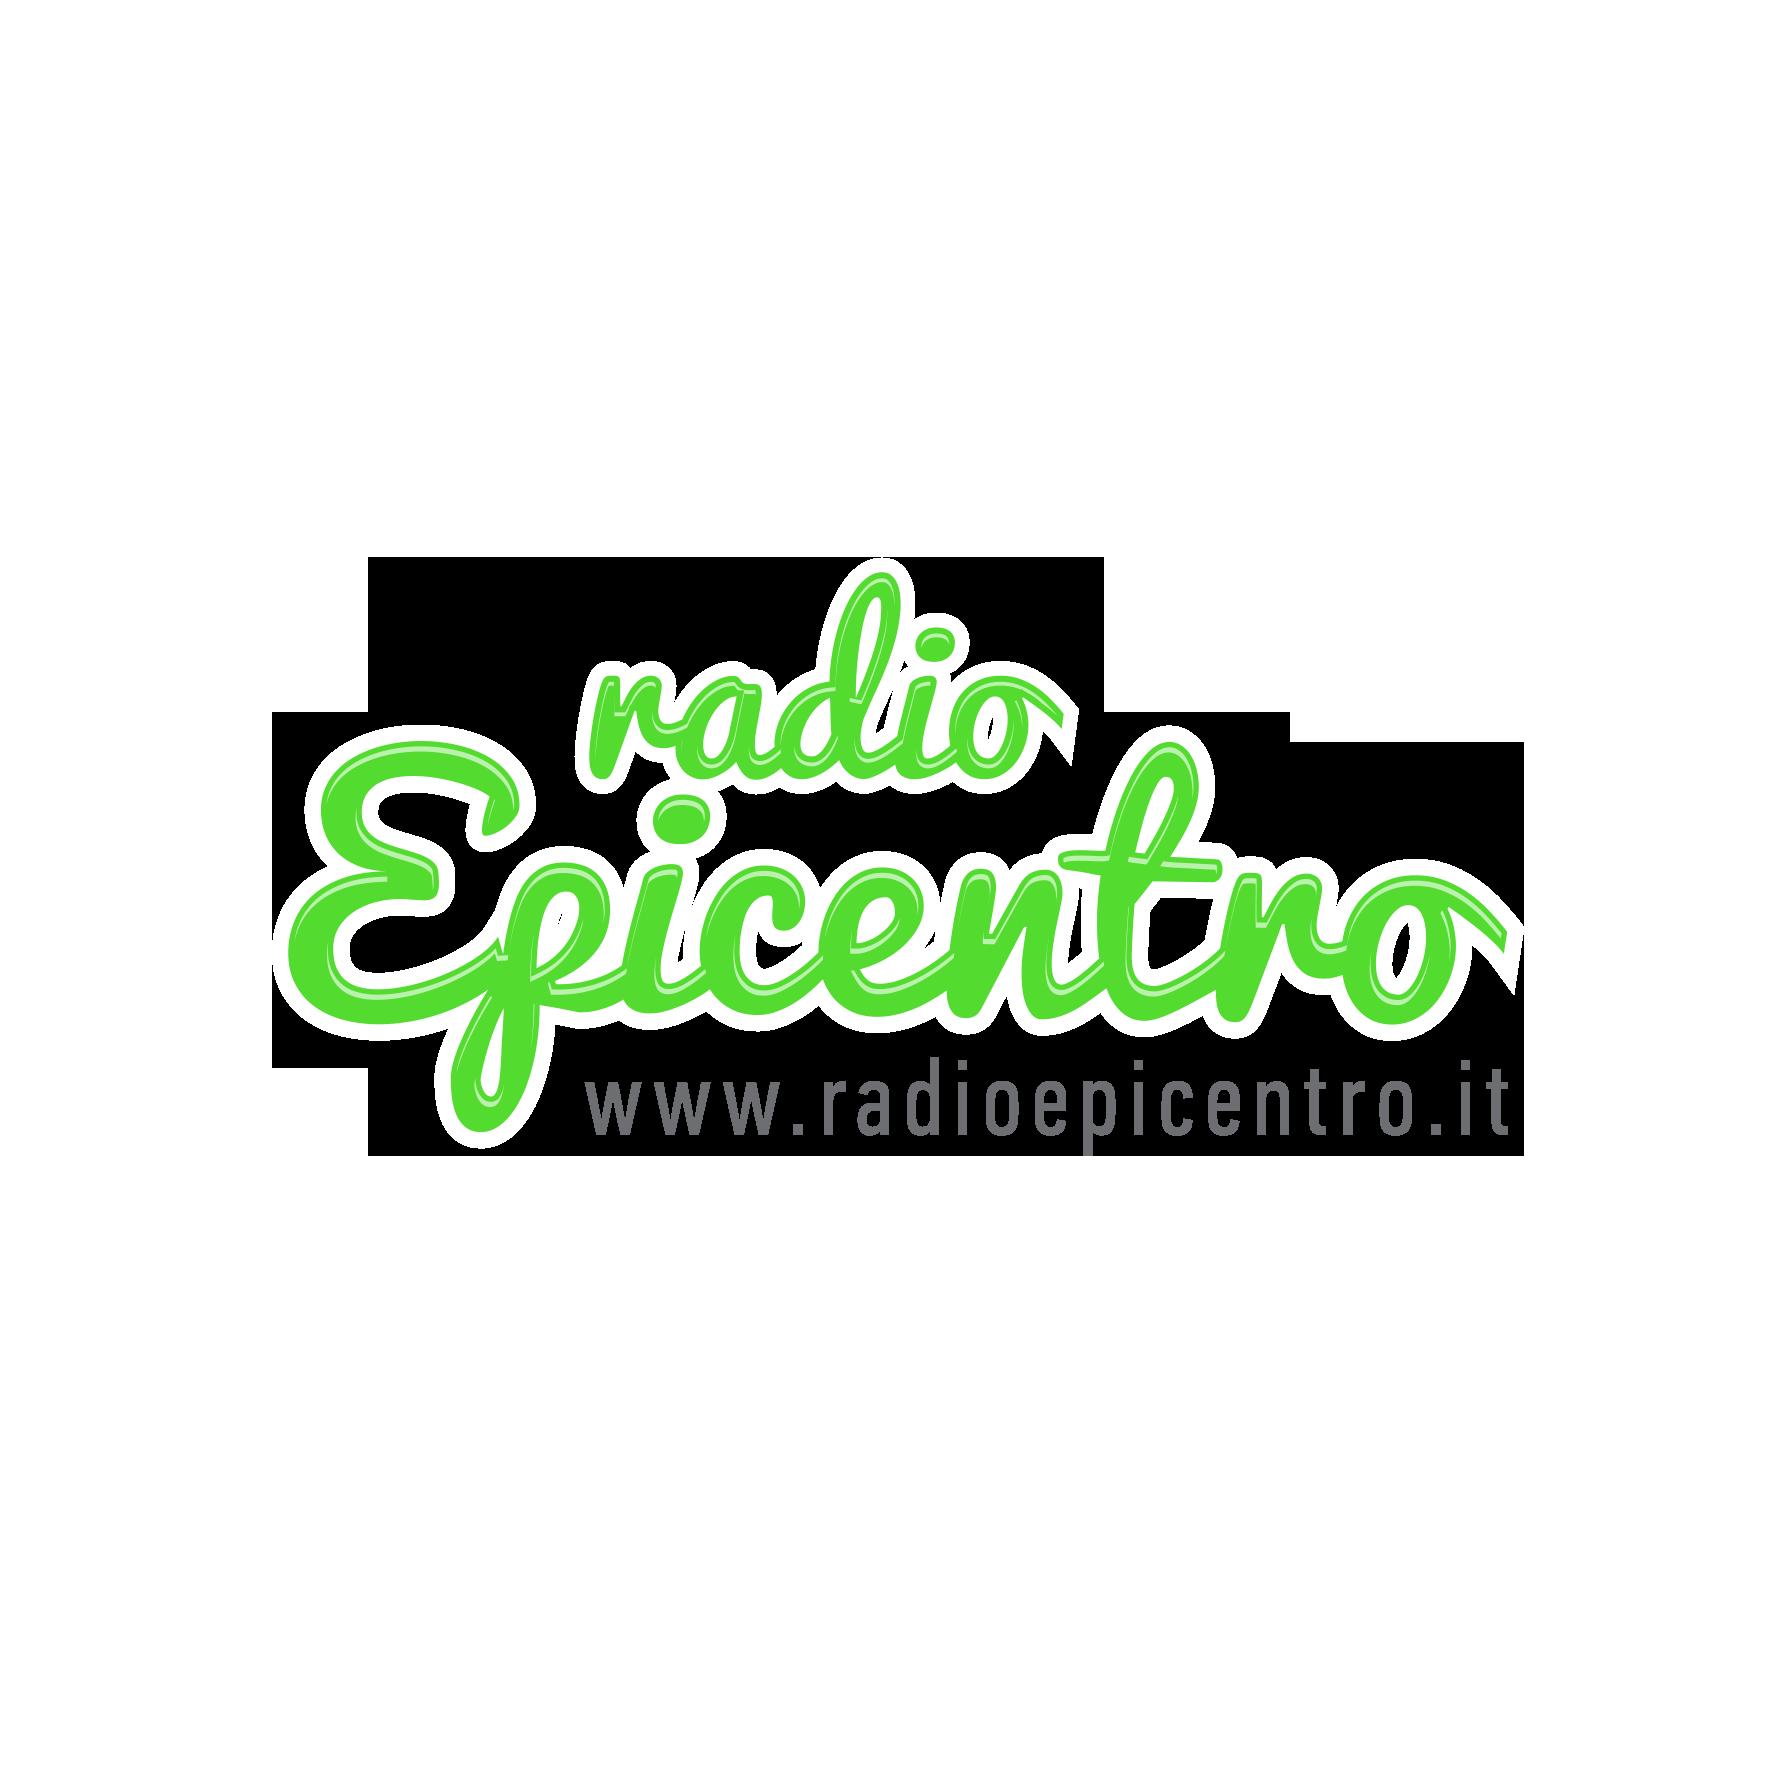 Radio Epicentro